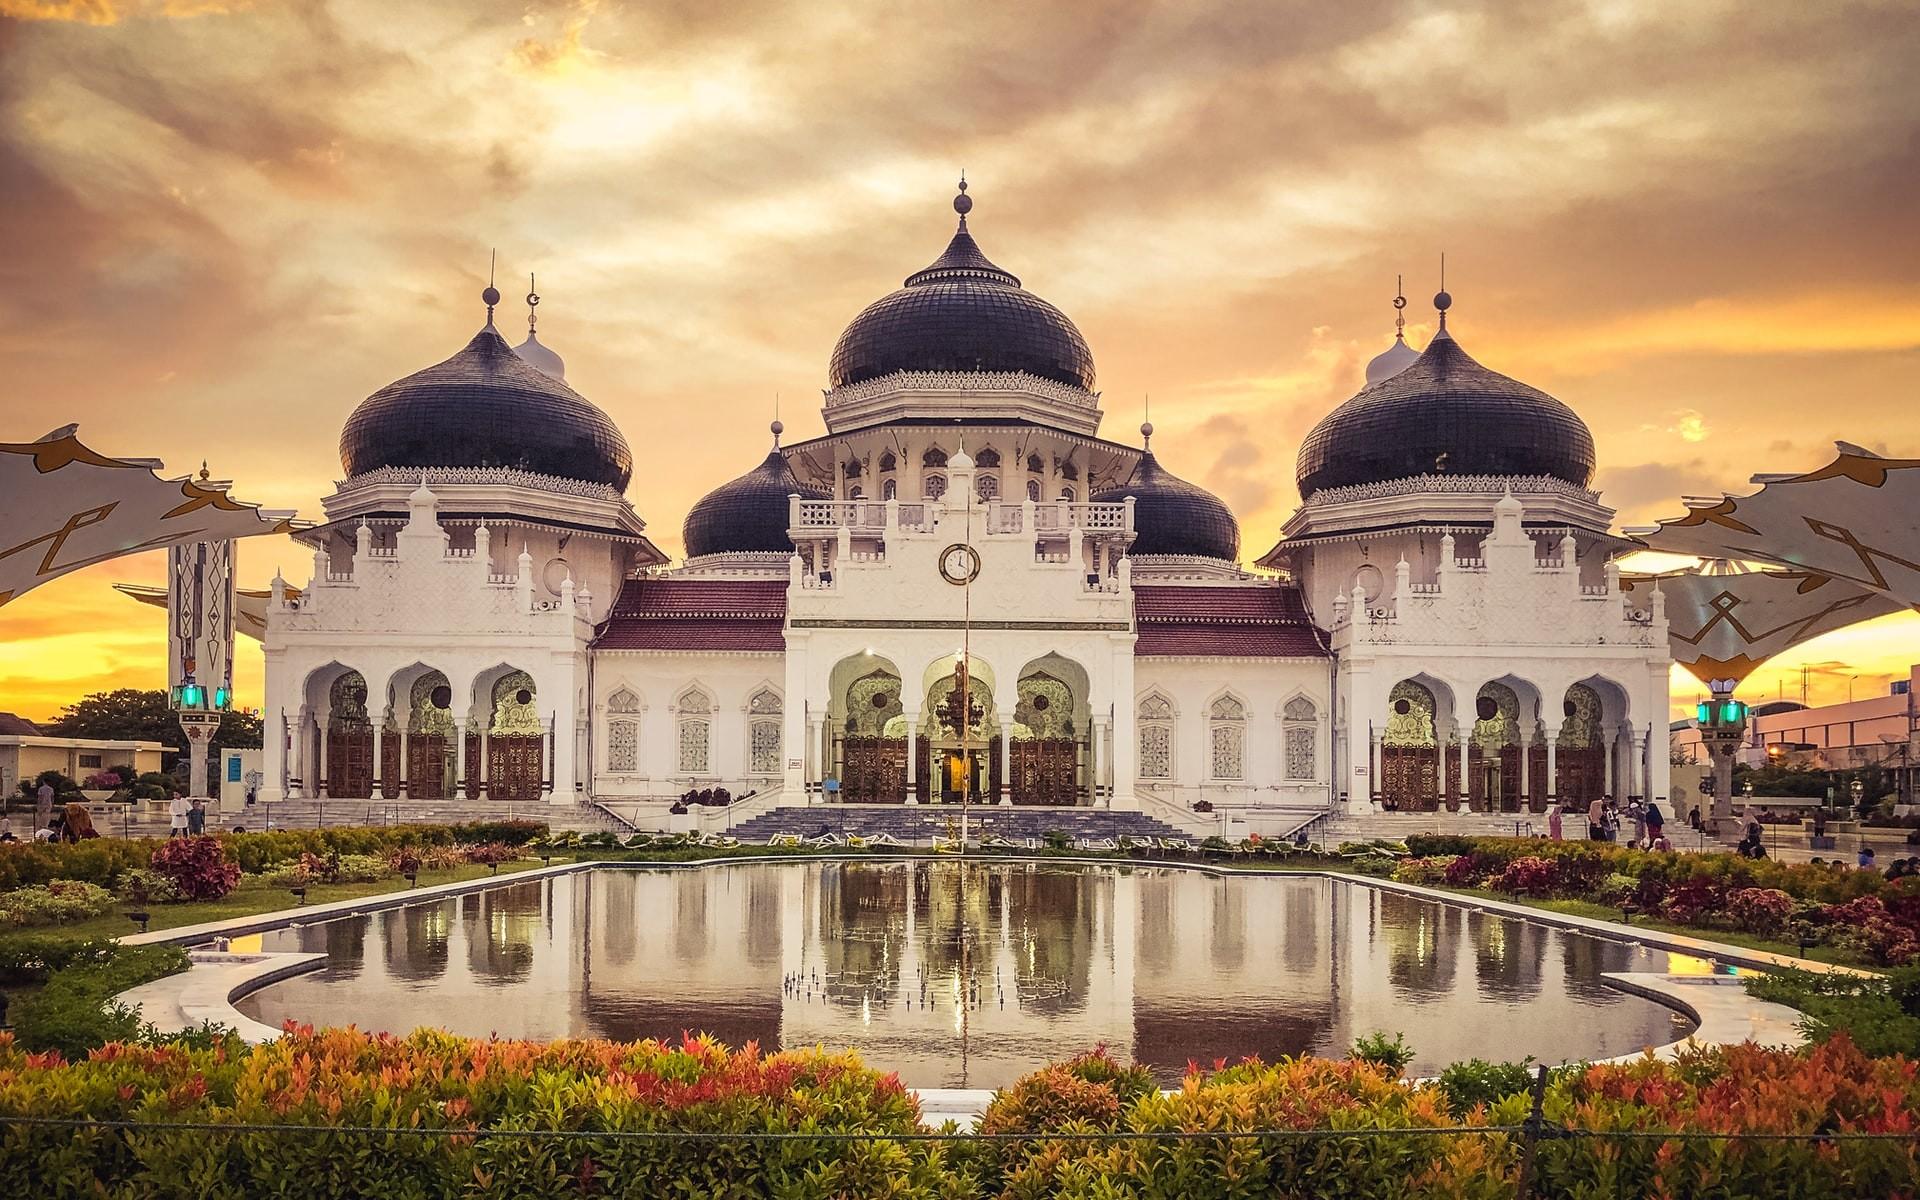 Masjid Baiturrahman Great Mosque Banda Aceh Indonesia